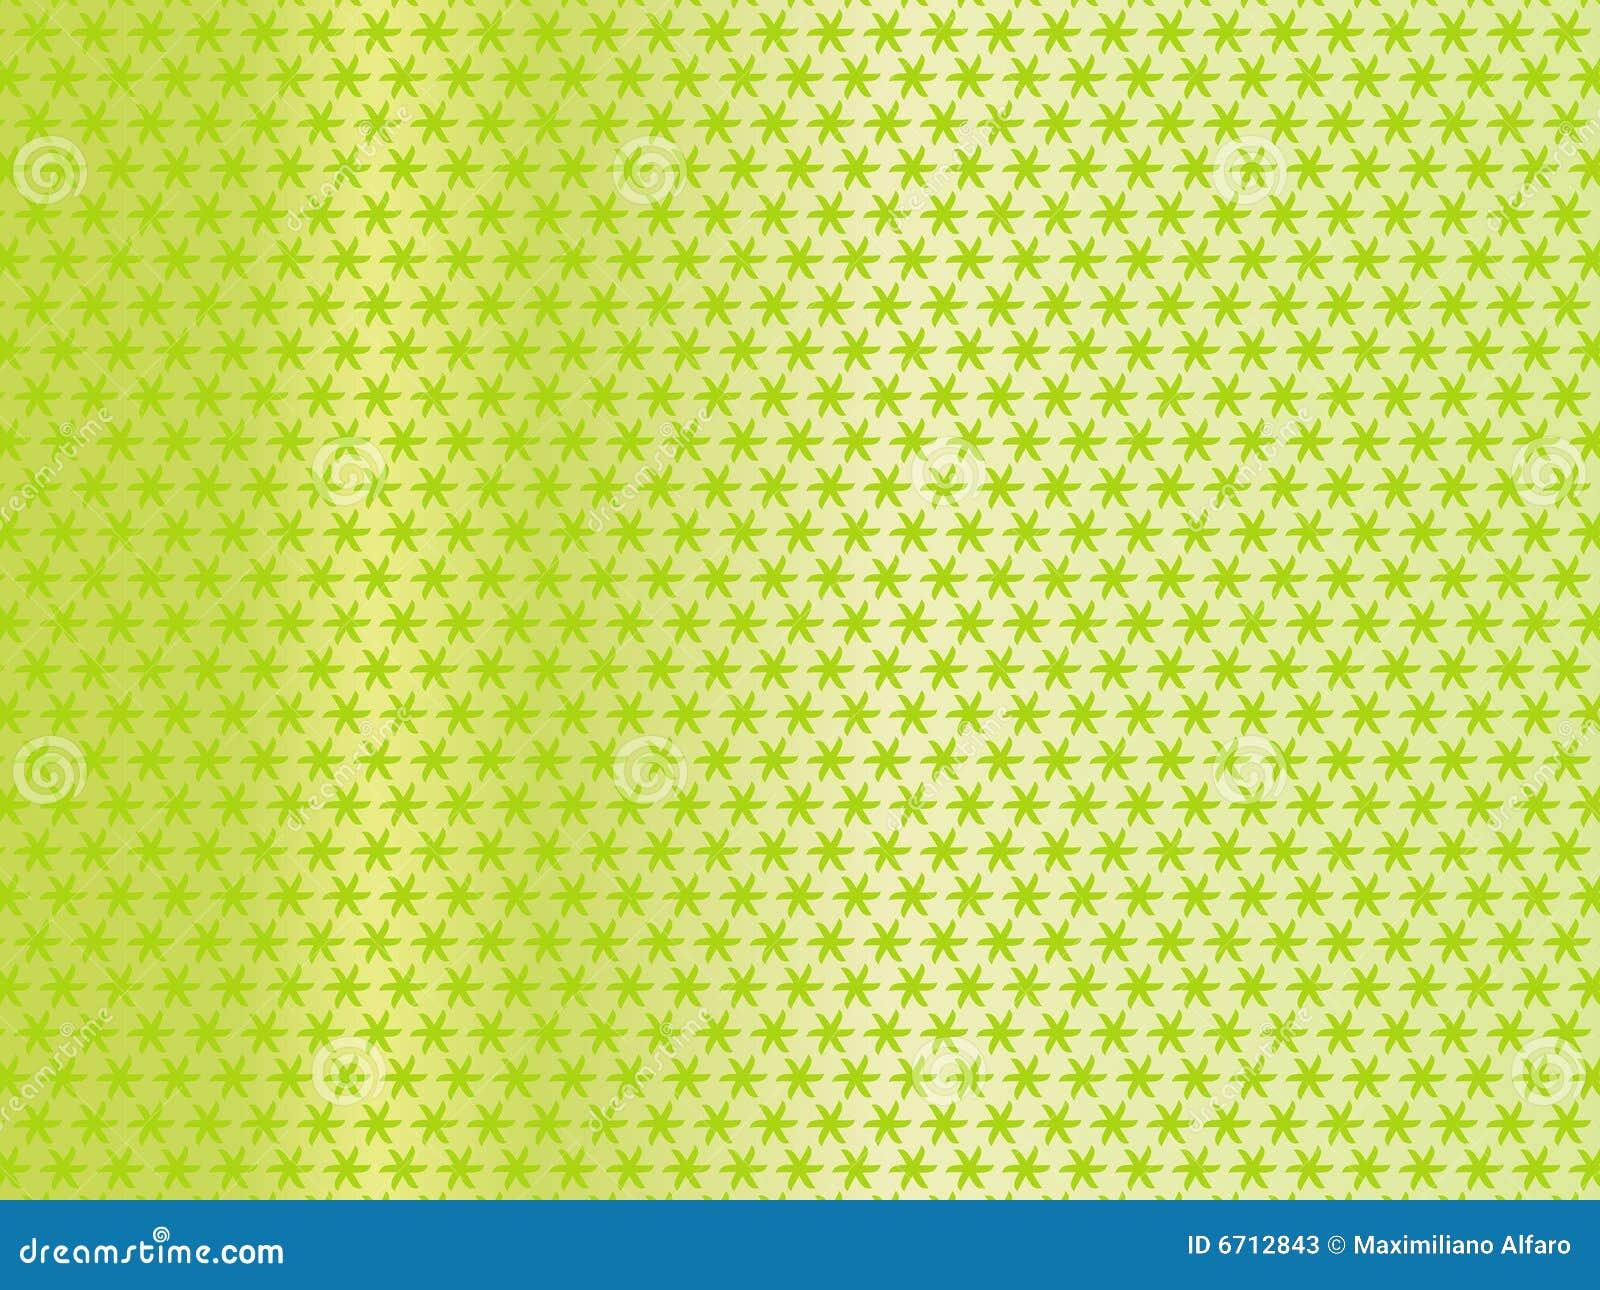 rideau vert photos stock image 6712843. Black Bedroom Furniture Sets. Home Design Ideas